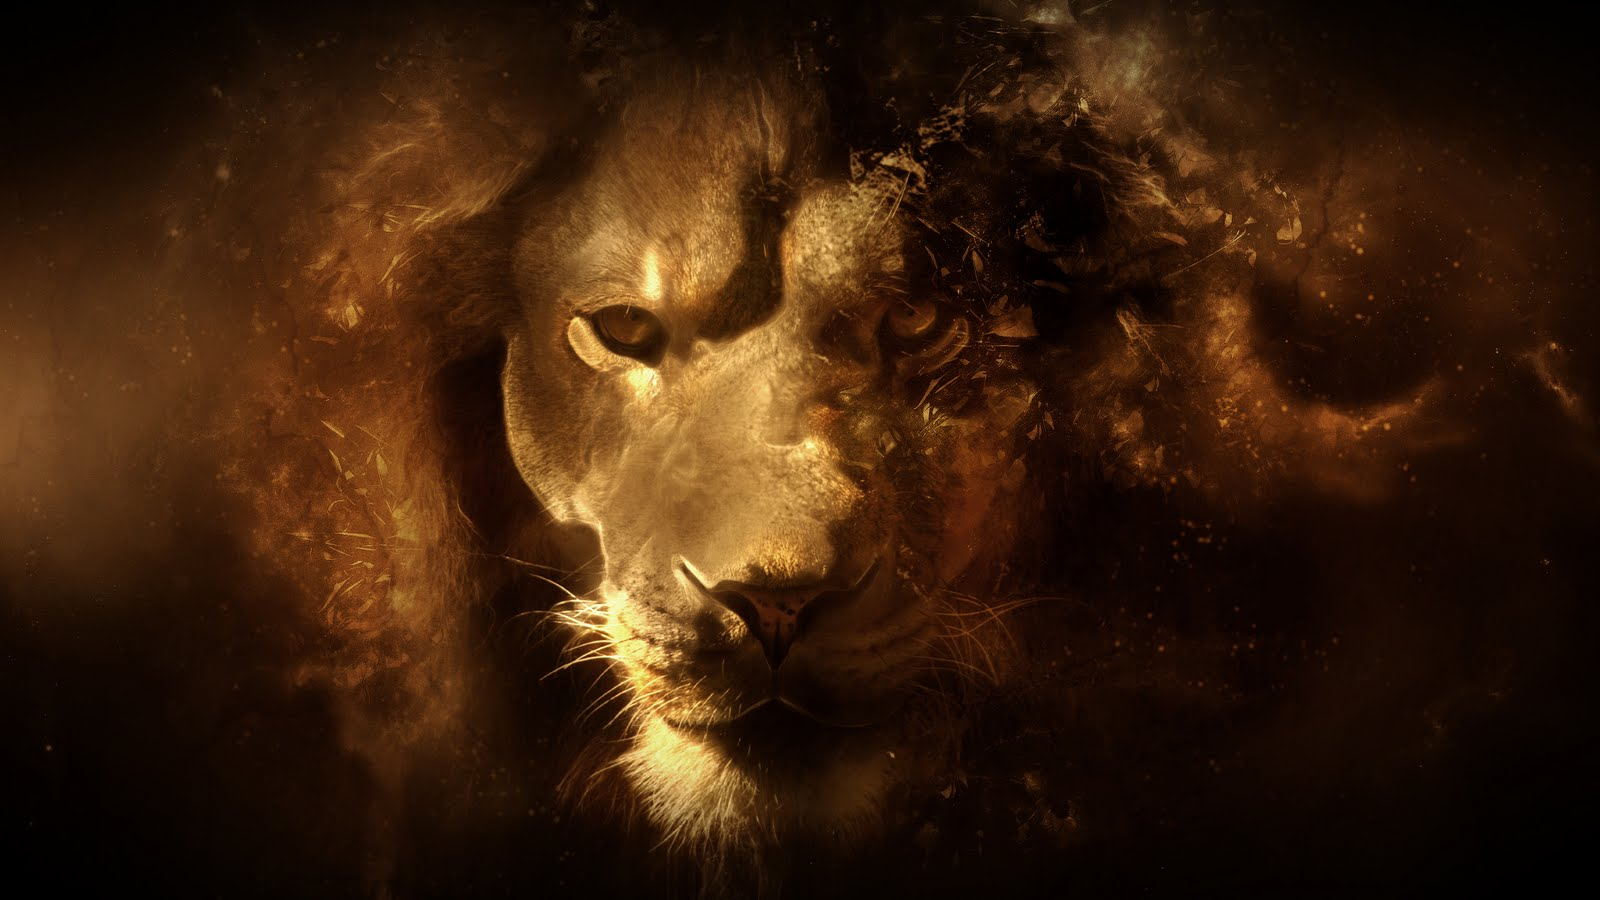 HD Wallpaper   Background ID:151419. 1600x900 Animal Lion